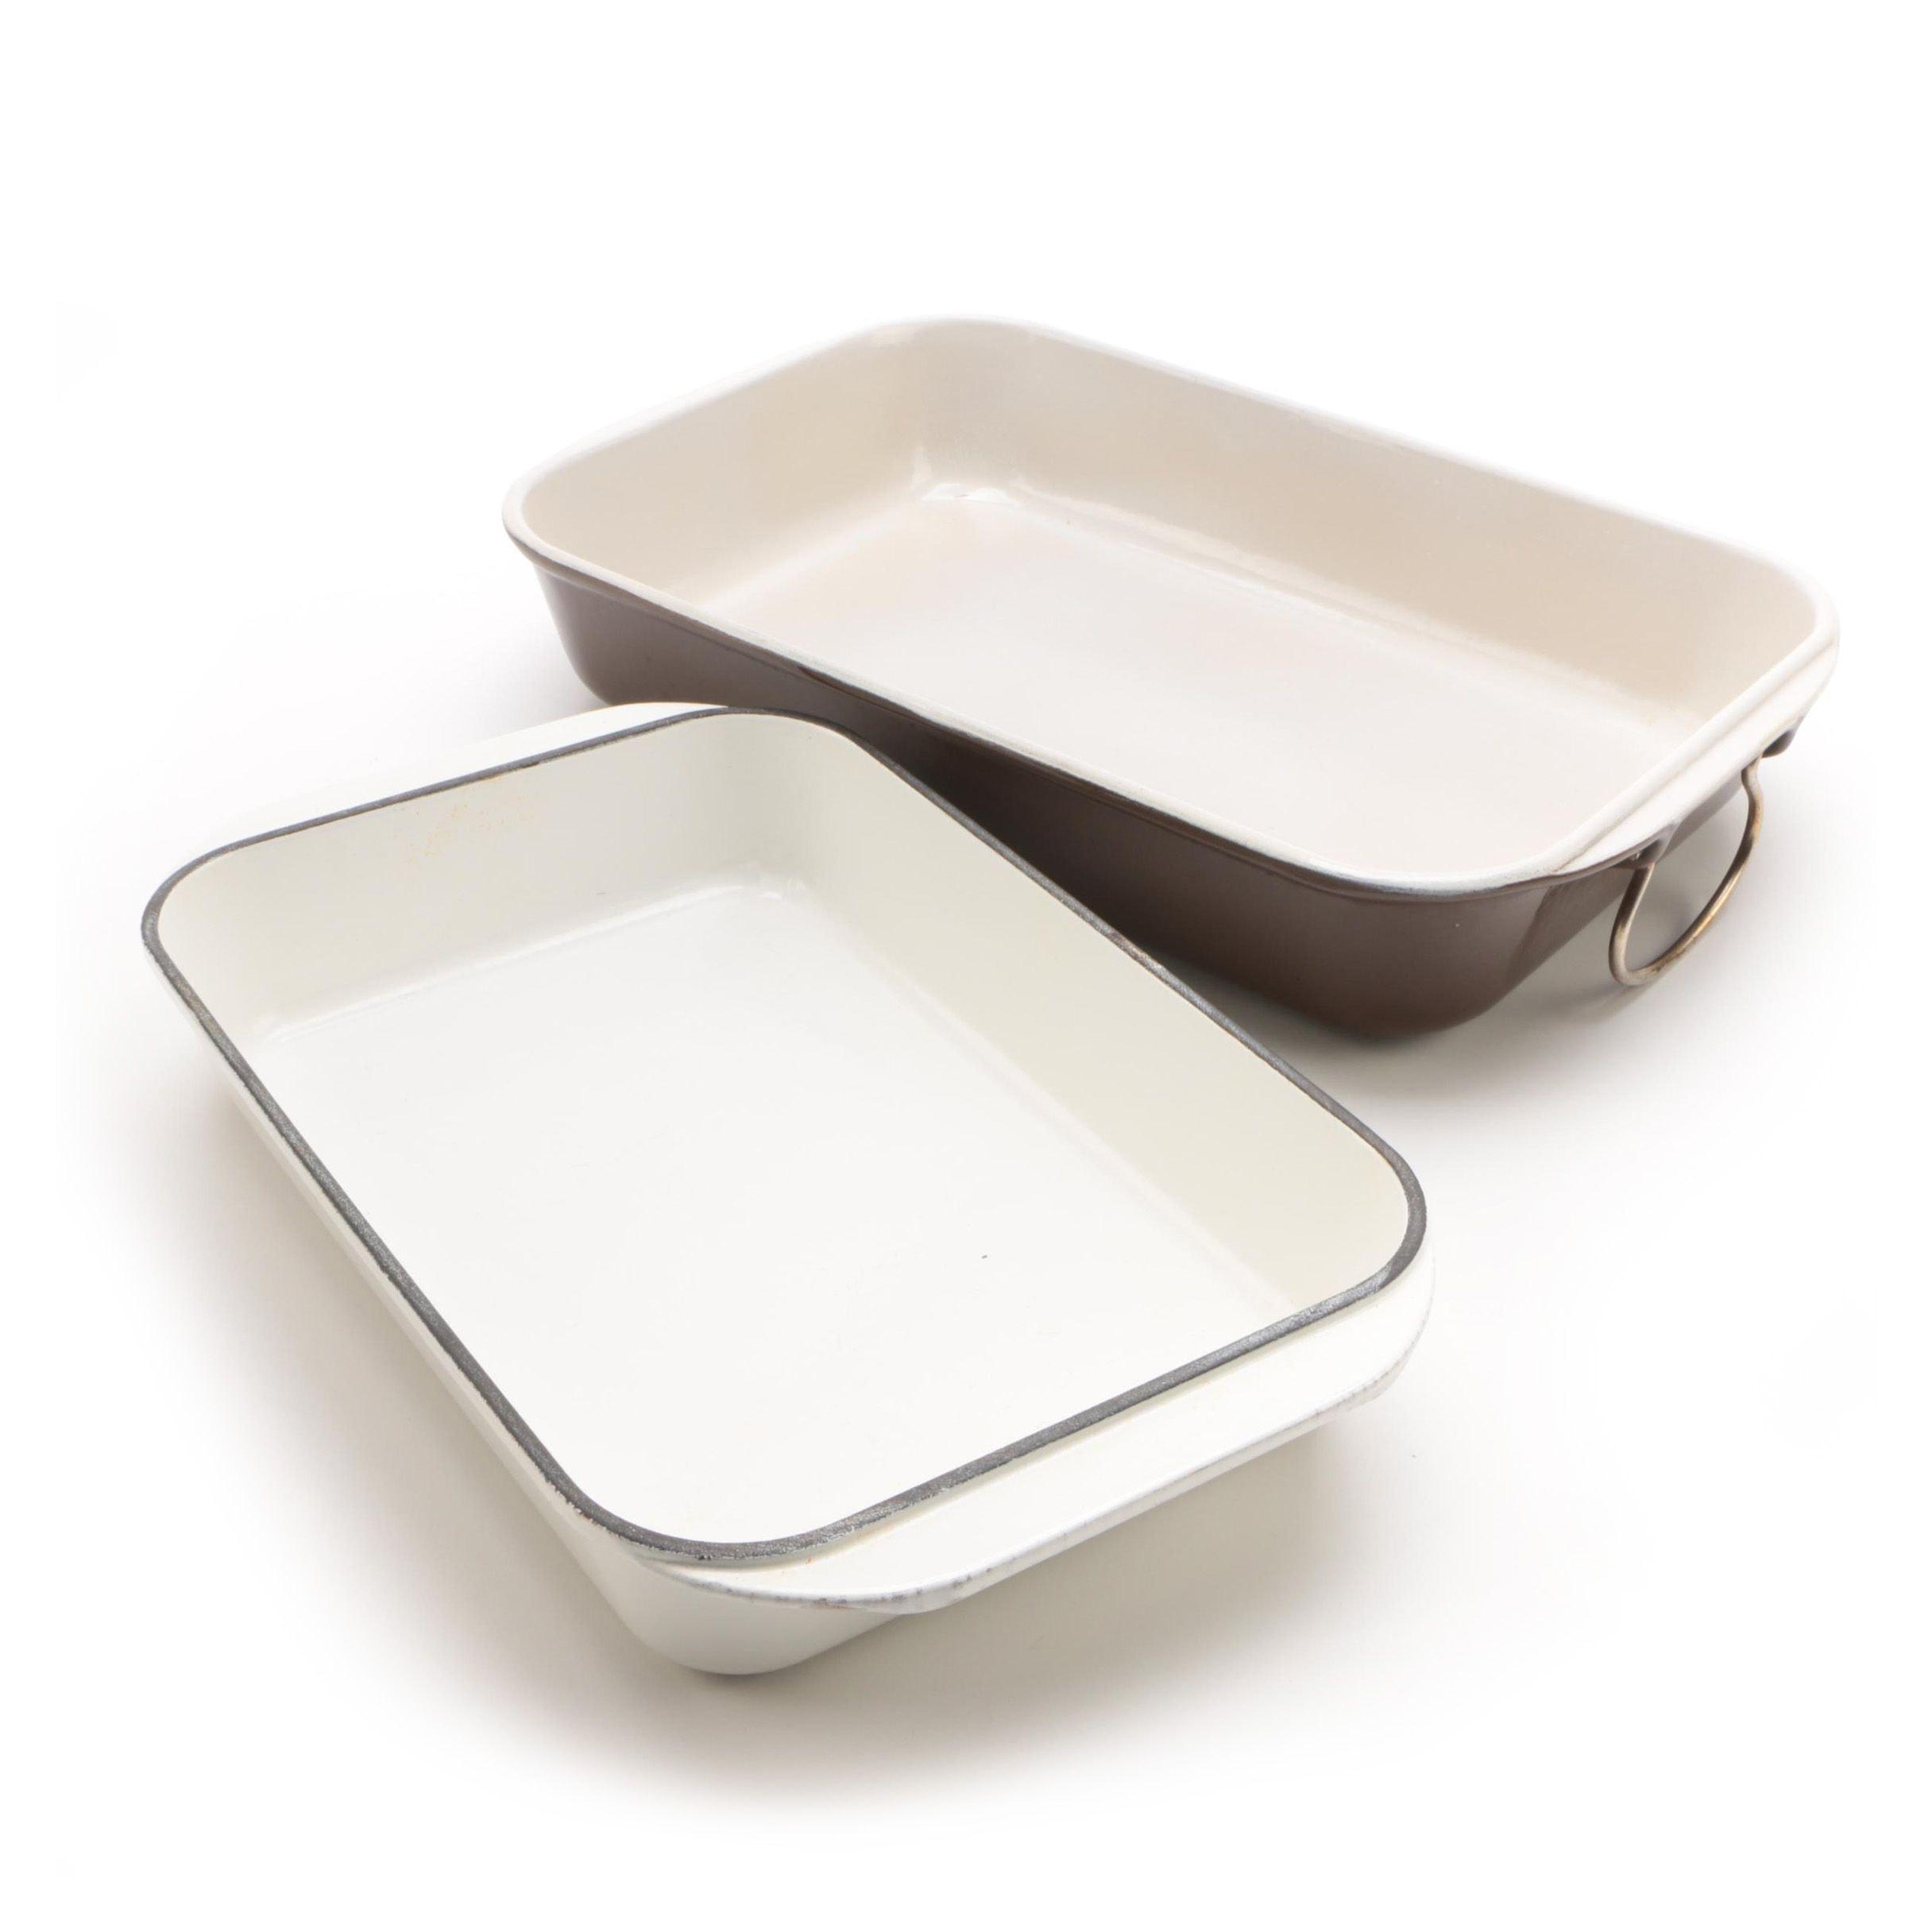 Vintage Le Creuset Enameled Roasting Pans